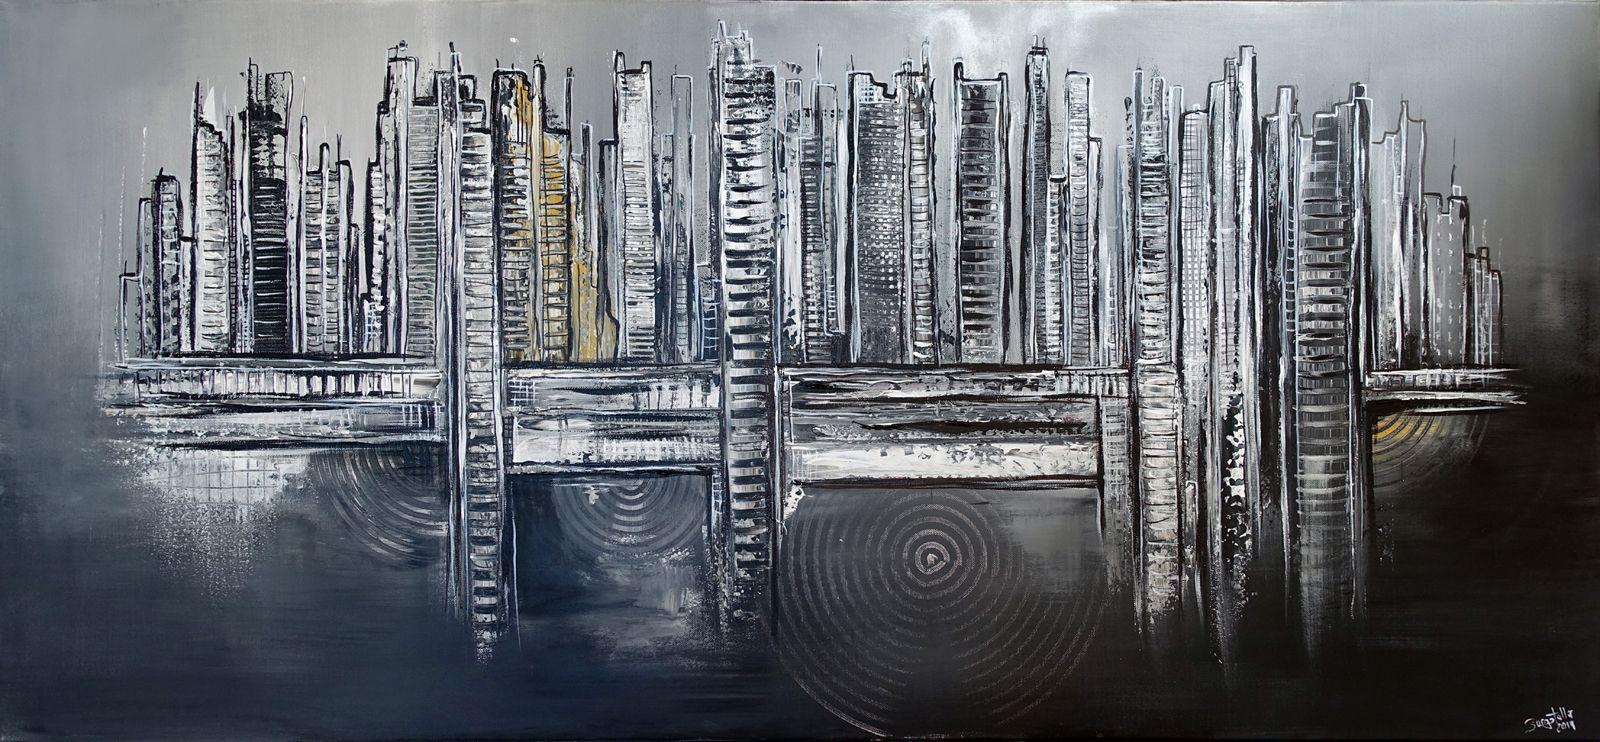 268 abstrakte gemalde verkauft schwarz weiss gold auftragsmalerei wandbilder original kunst abstraktes abstrakt verkaufen acrylbilder geometrisch